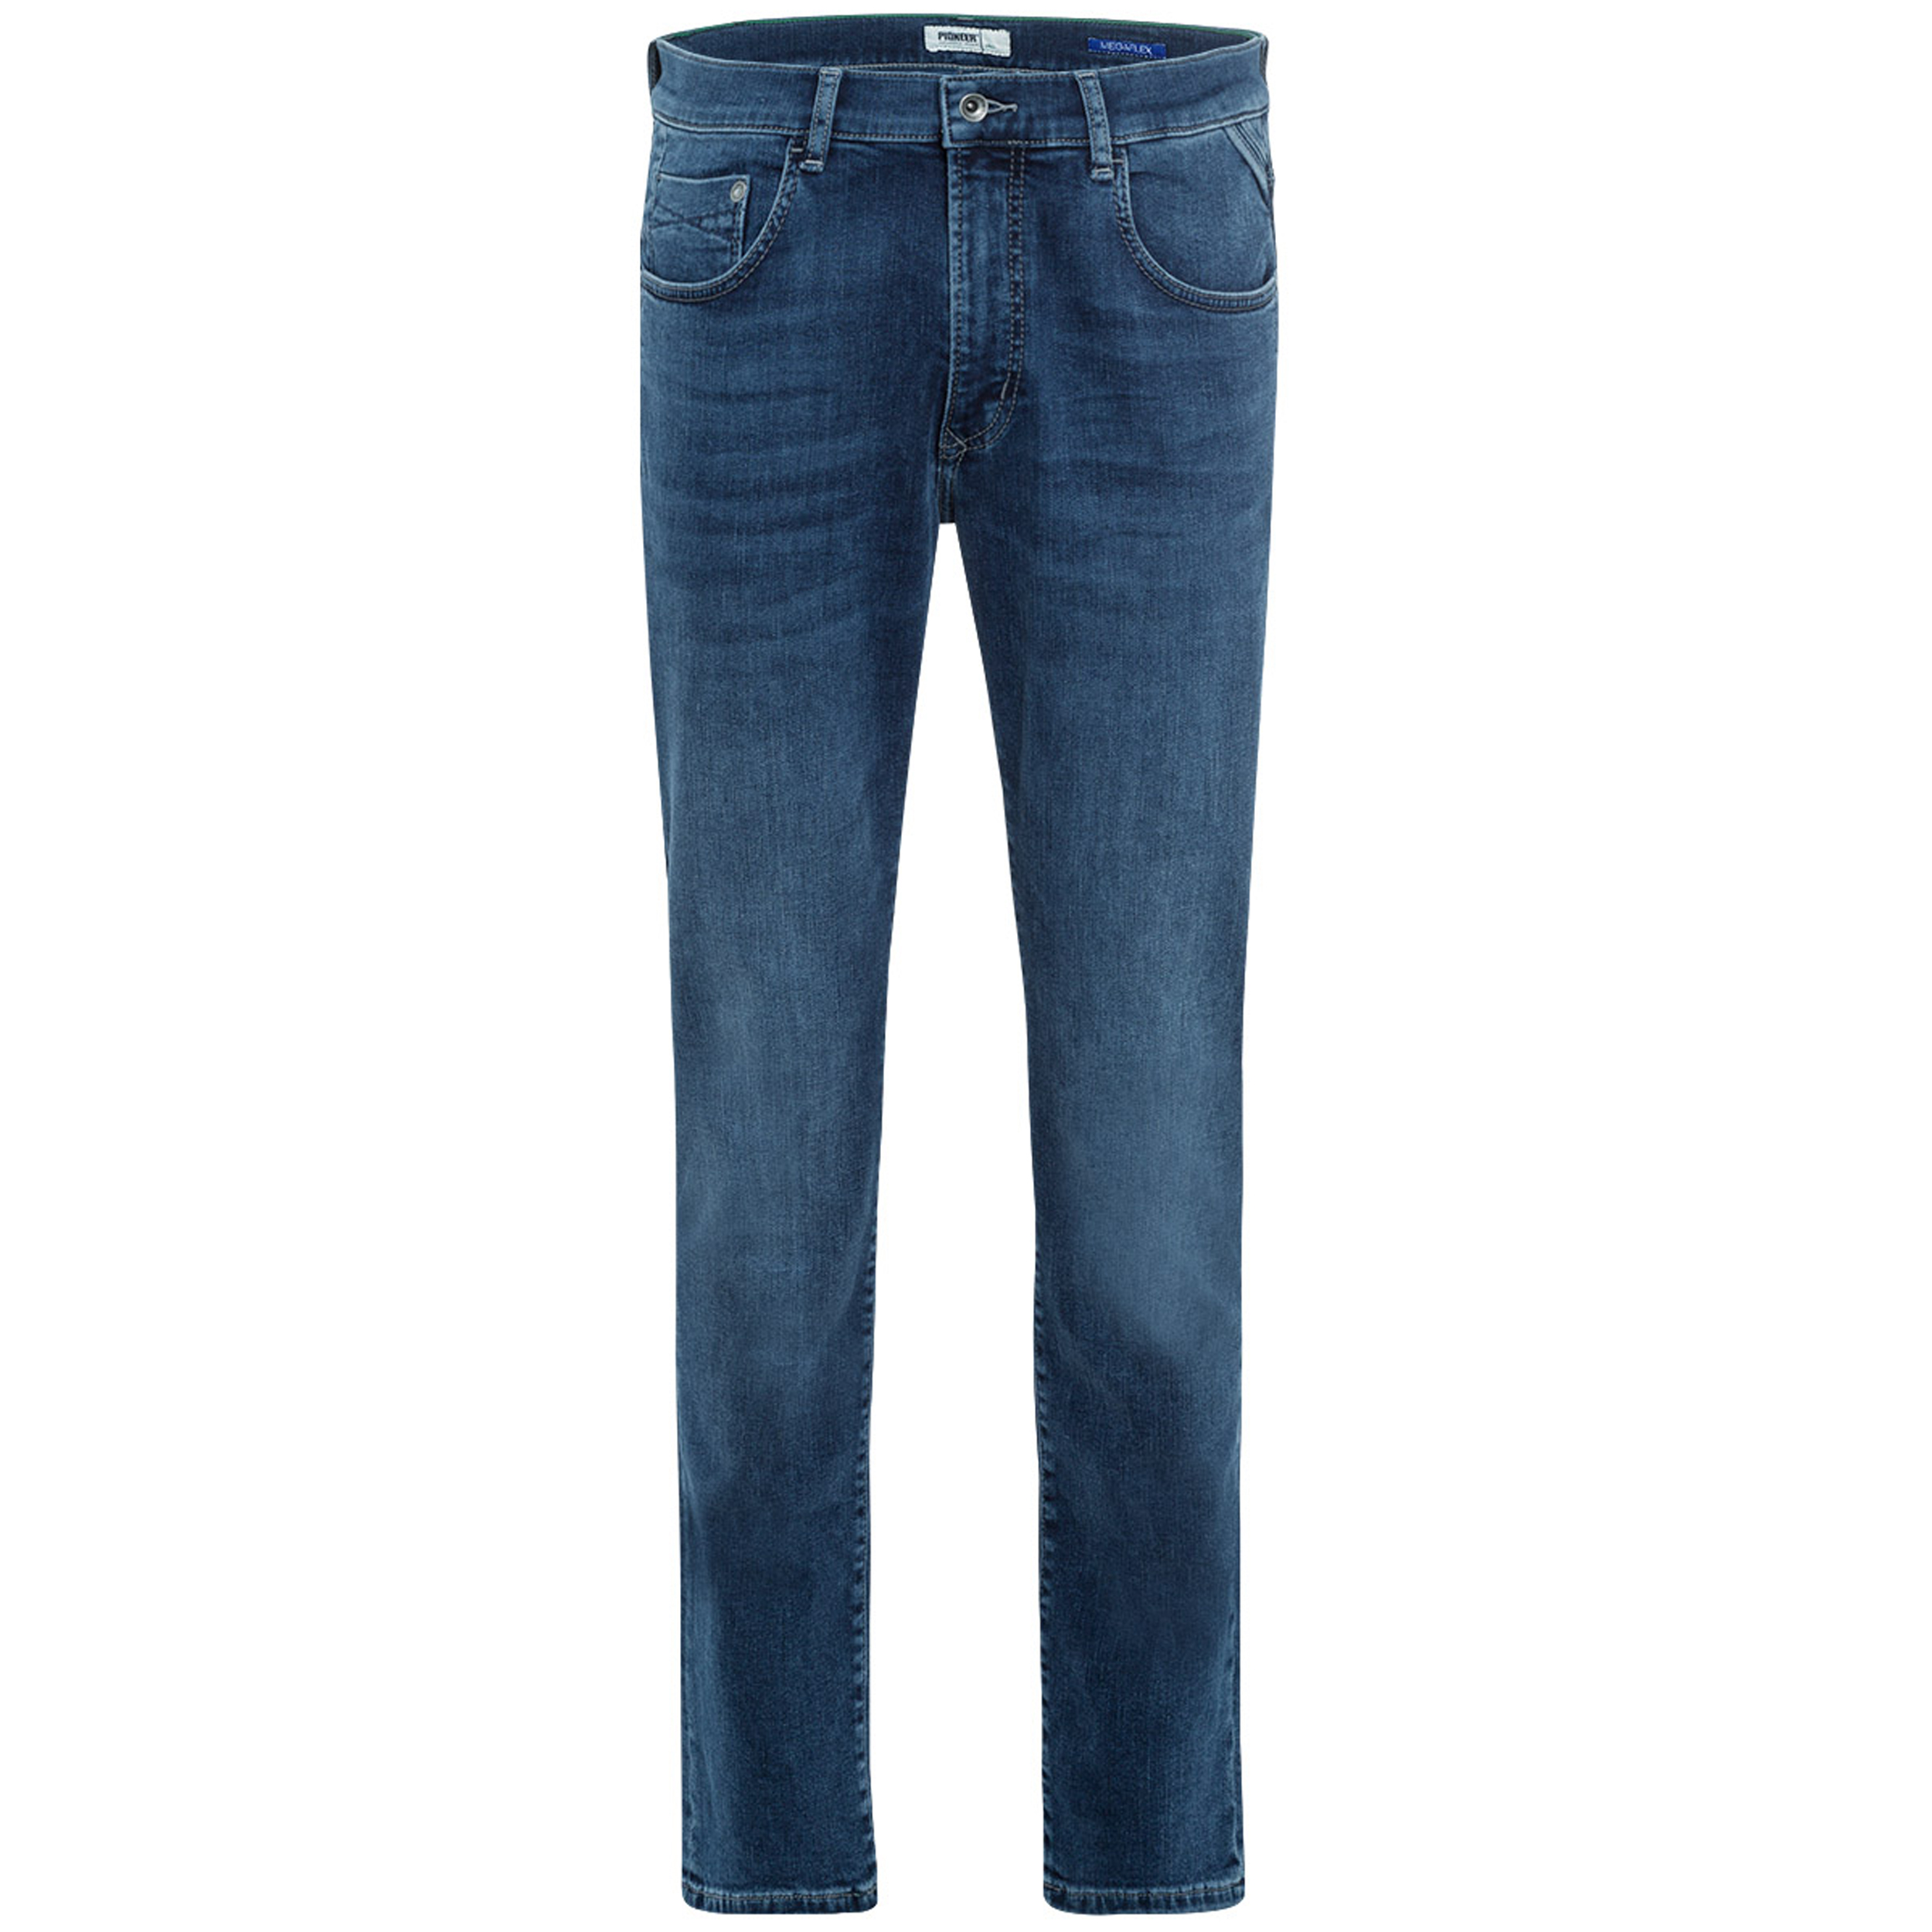 Pioneer Herren Jeans Eric Megaflex - stone blue 31/32